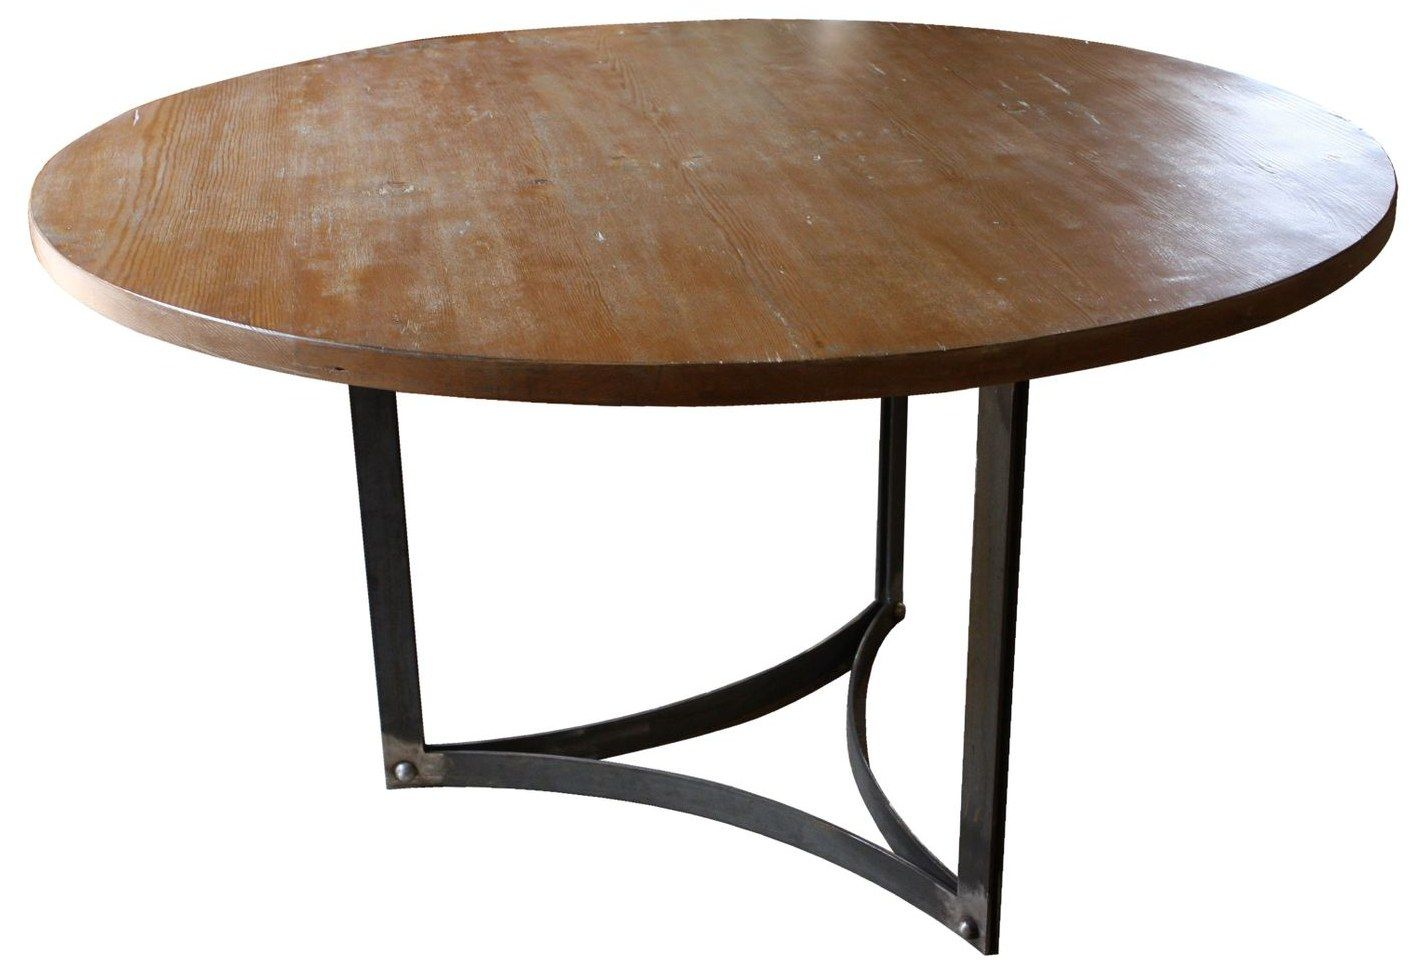 round oak kitchen tables round kitchen table Unique Round Wood Kitchen Tables Cliff Kitchen